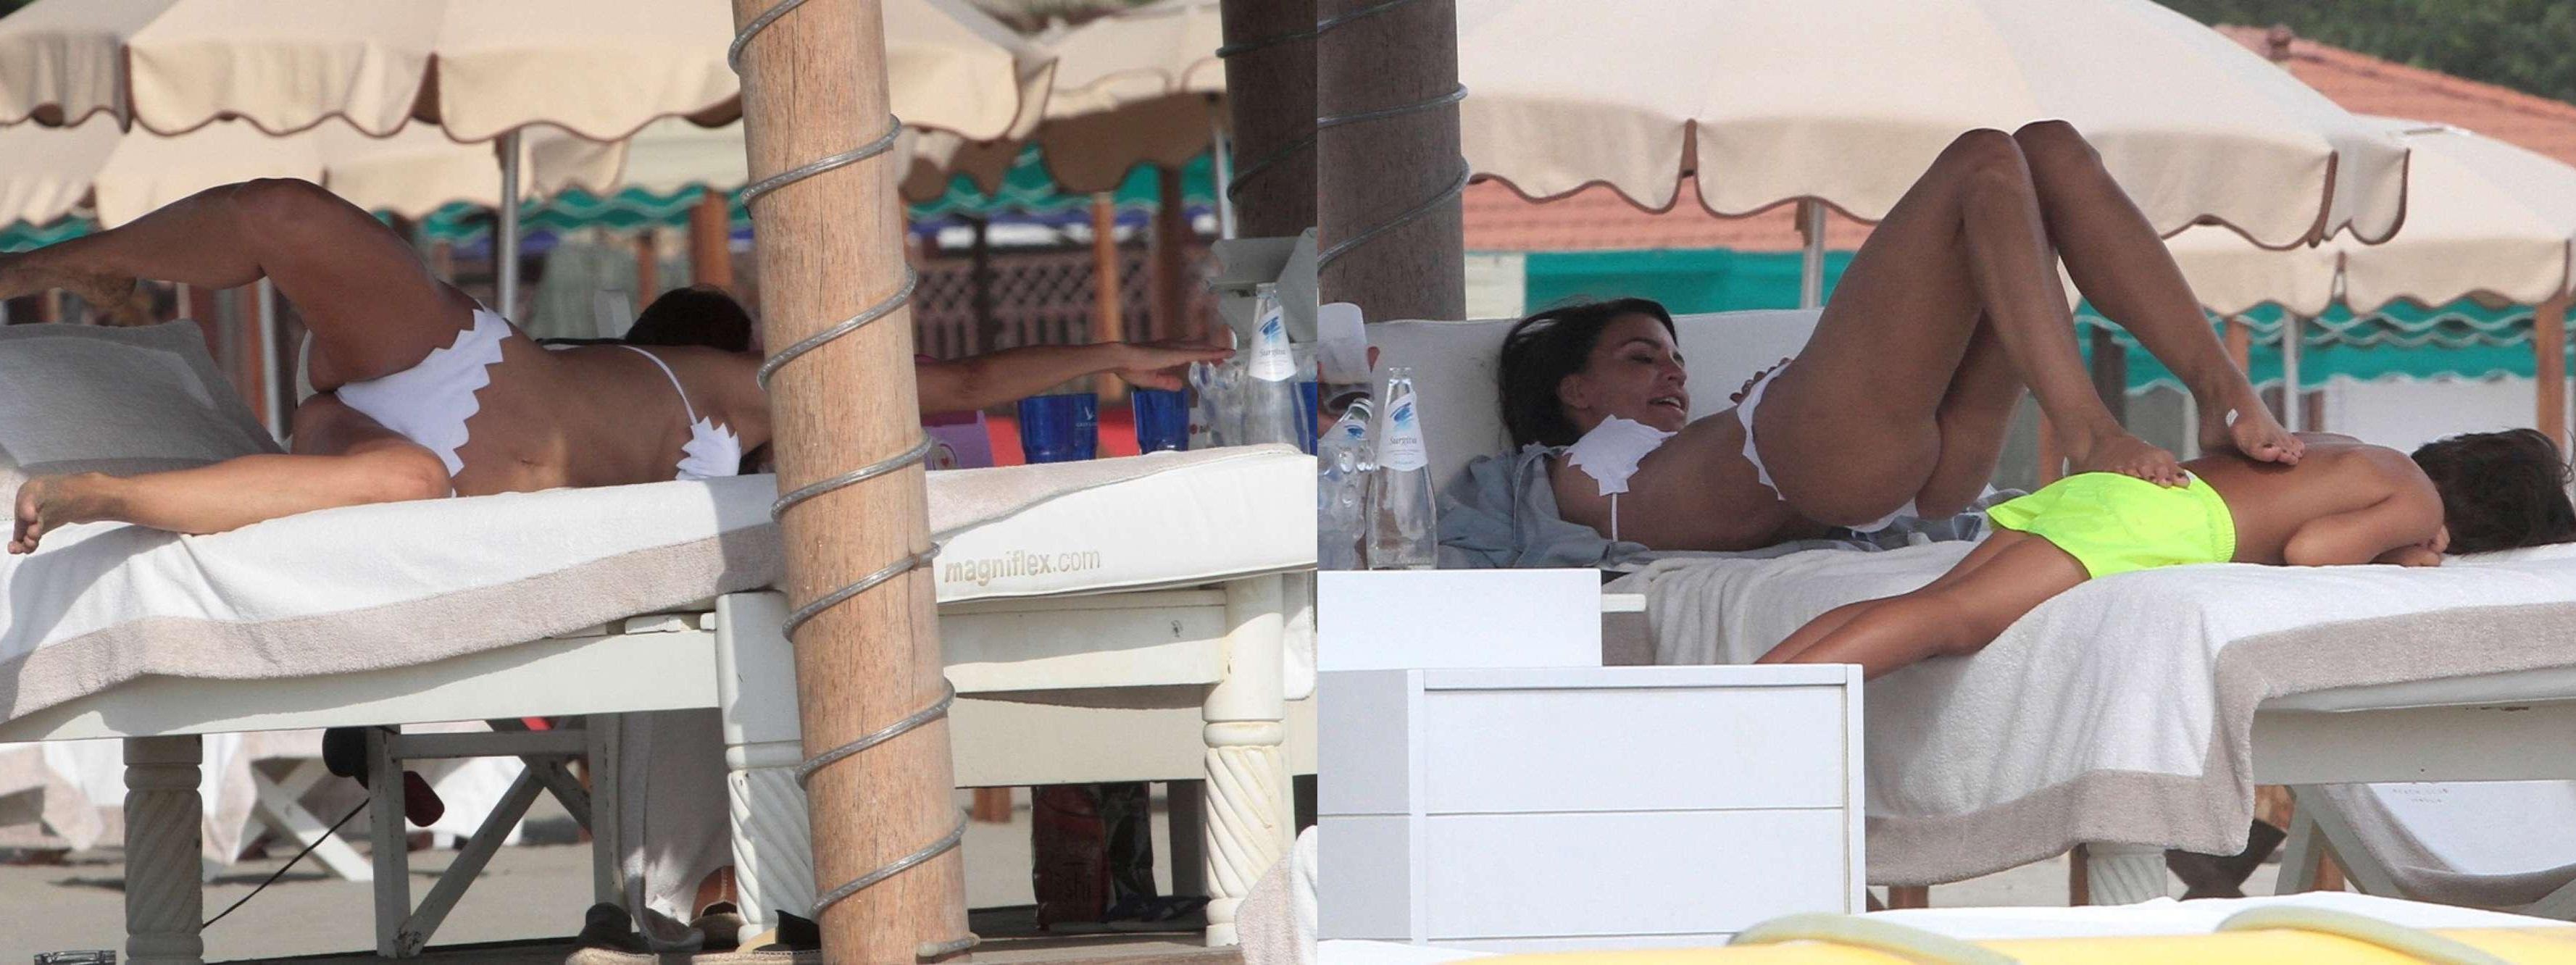 Claudia Galanti, acrobazie da vip in spiaggia